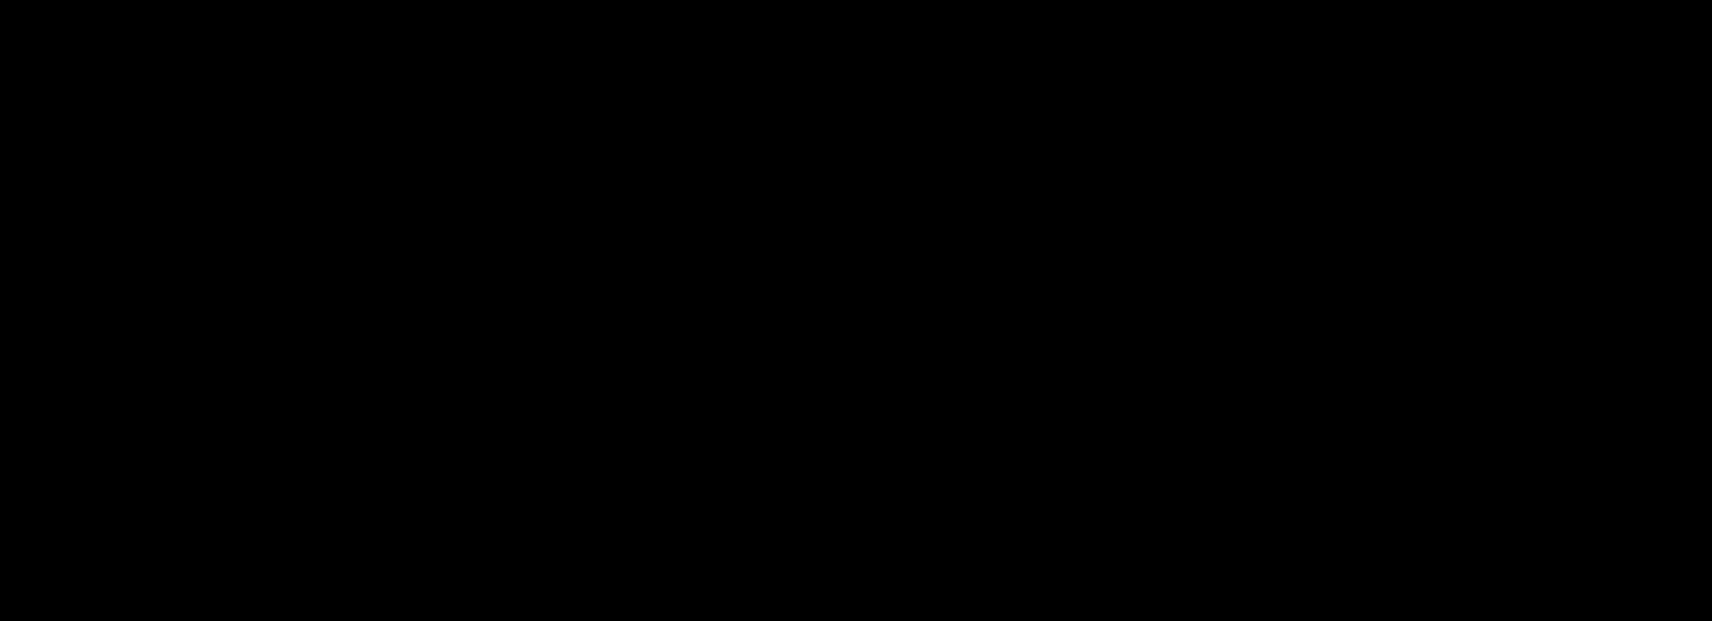 Astra Coupon Code